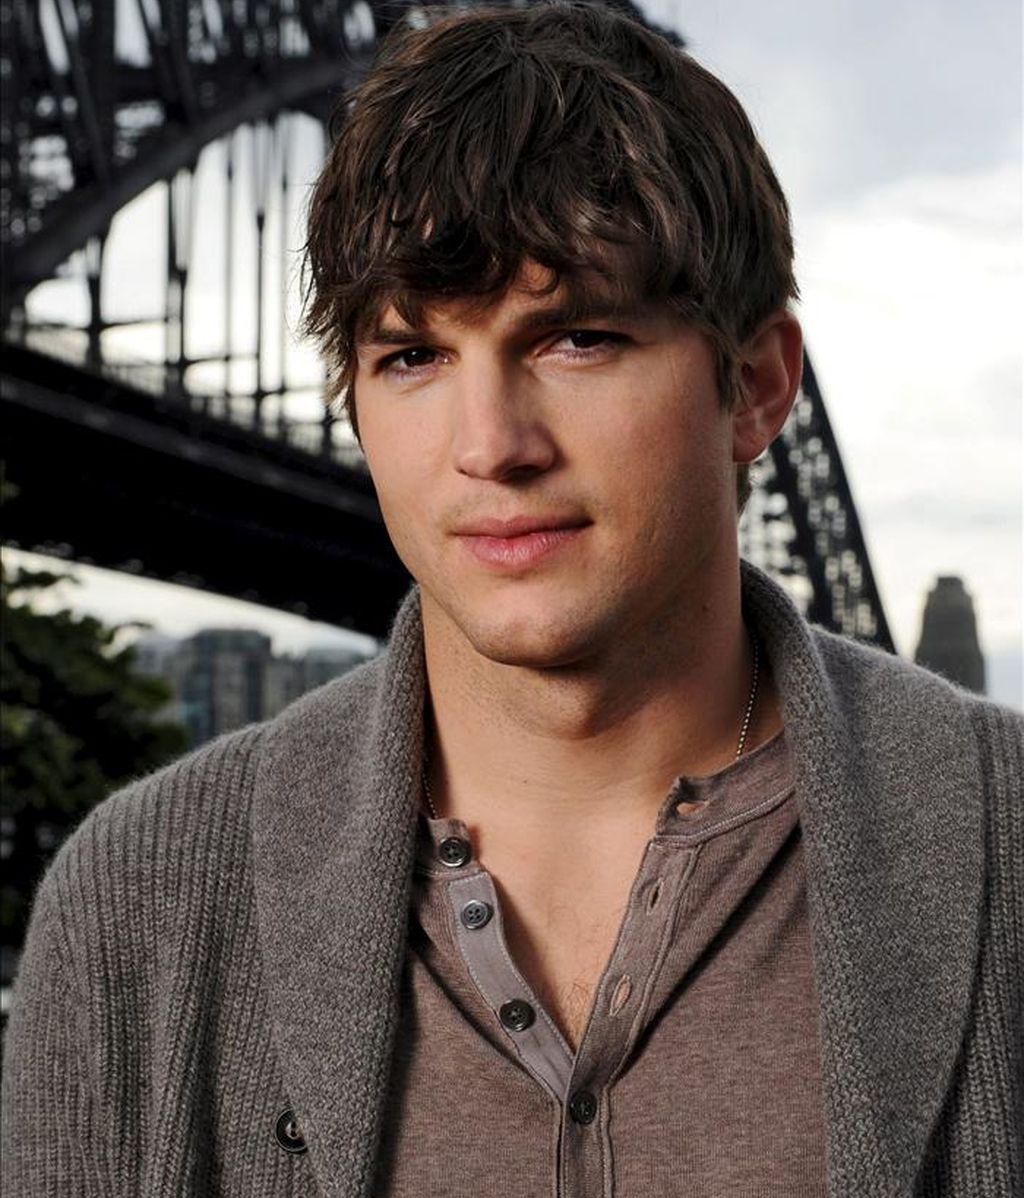 El actor estadounidense Ashton Kutcher. EFE/Archivo